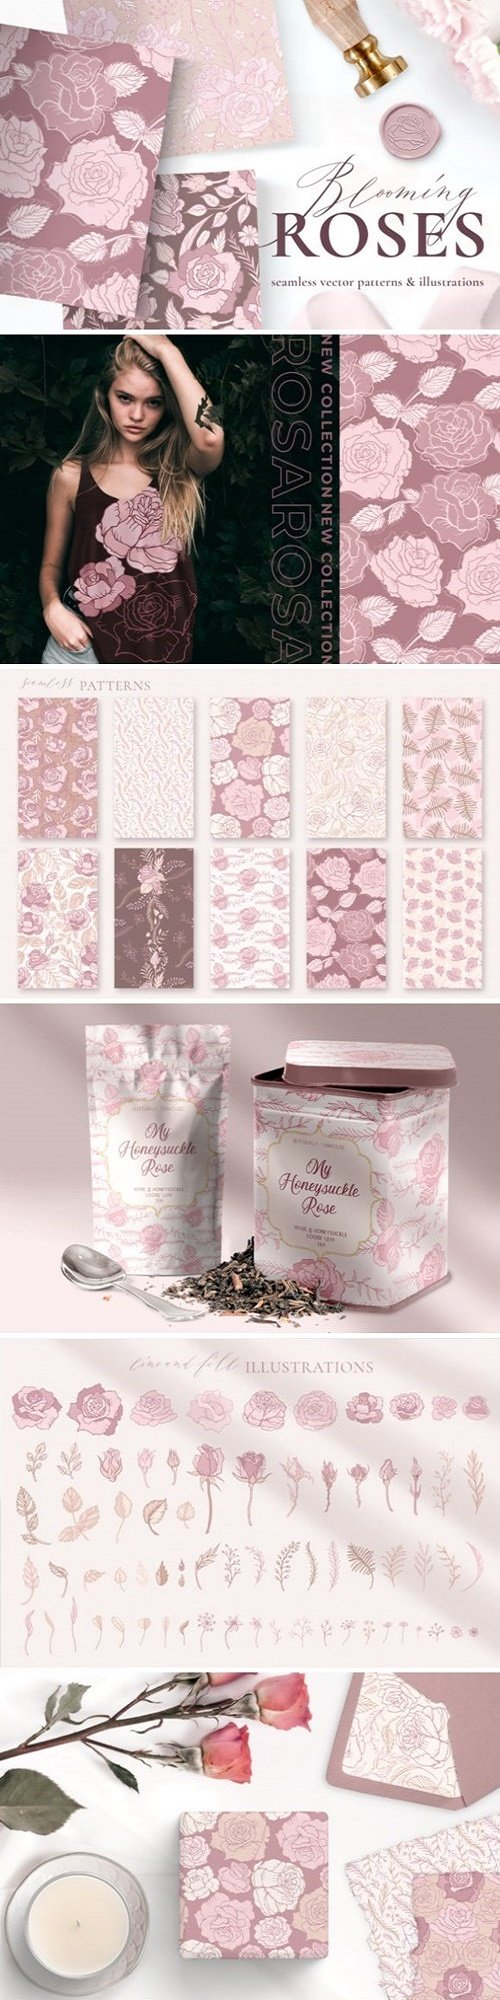 Rose Flower Patterns & Illustrations - 4586765